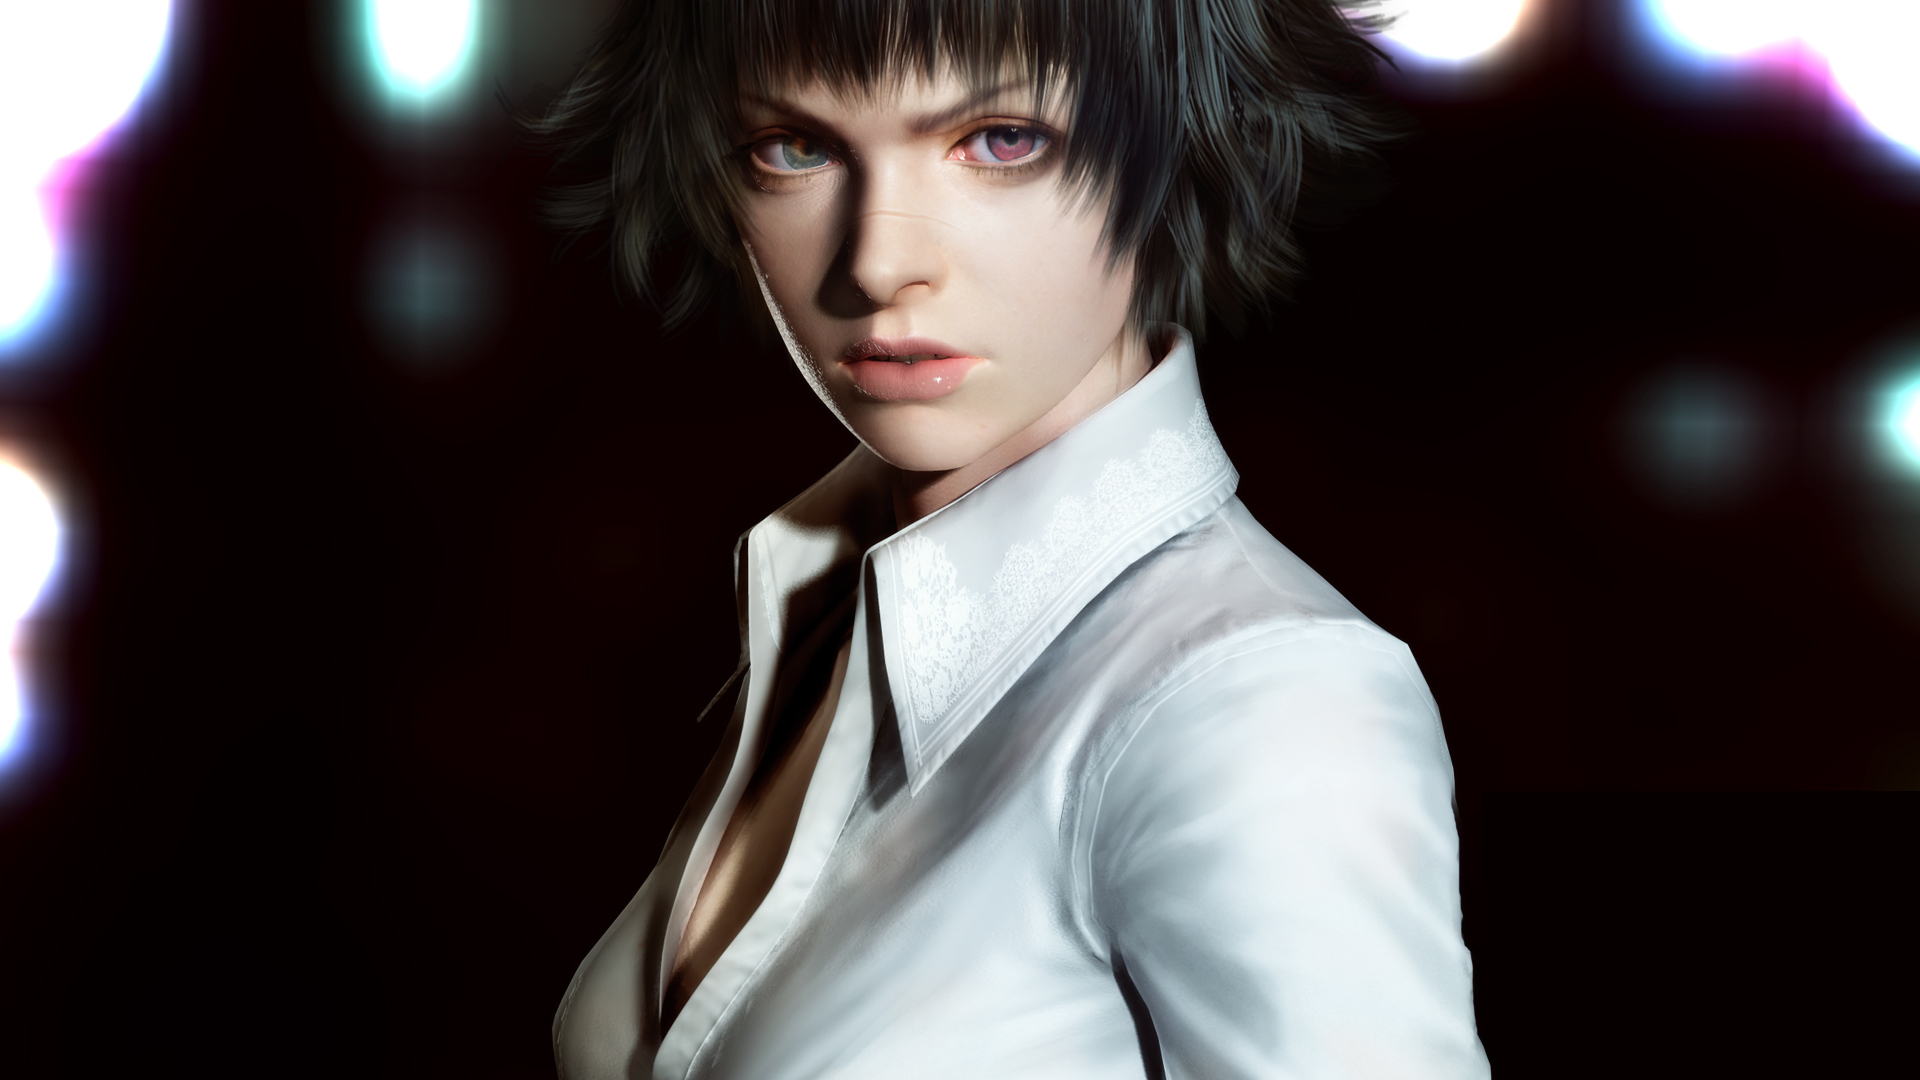 Devil May Cry 3 Dante S Awakening Hd Wallpaper Background Image